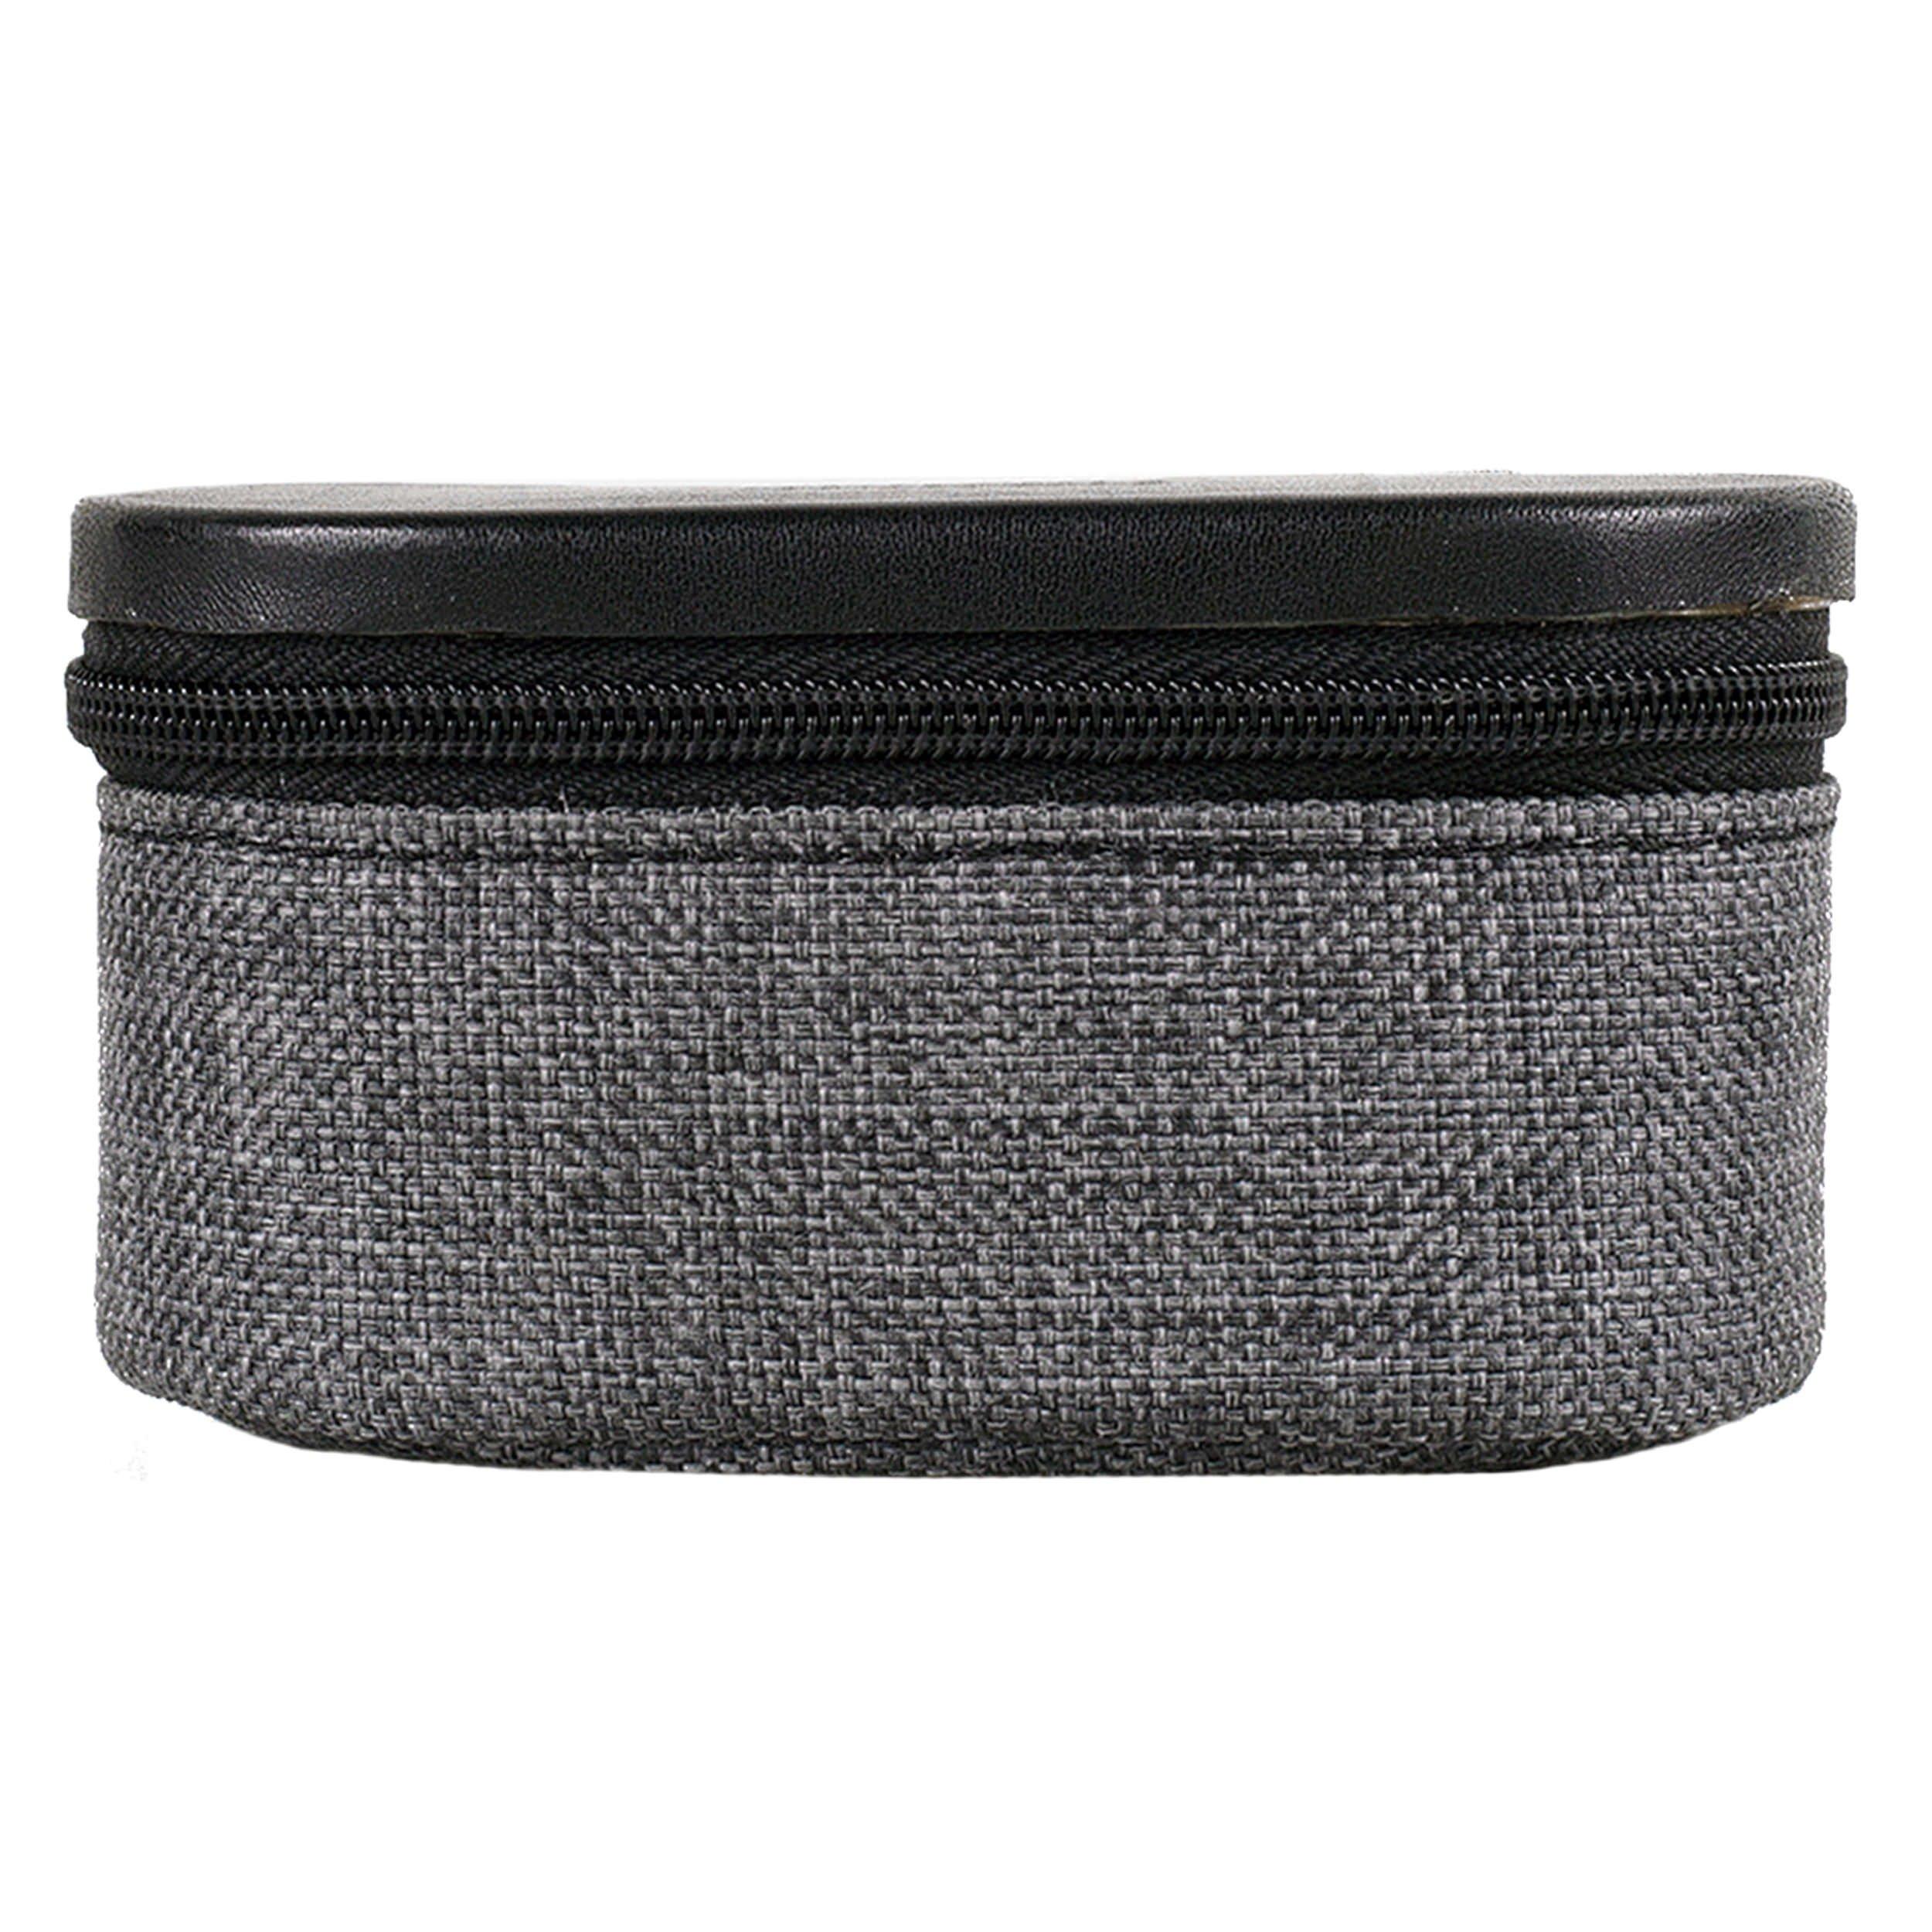 ویکالا · خرید  اصل اورجینال · خرید از آمازون · Moment - Lens Pouch - Carry 2 Small Lenses wekala · ویکالا